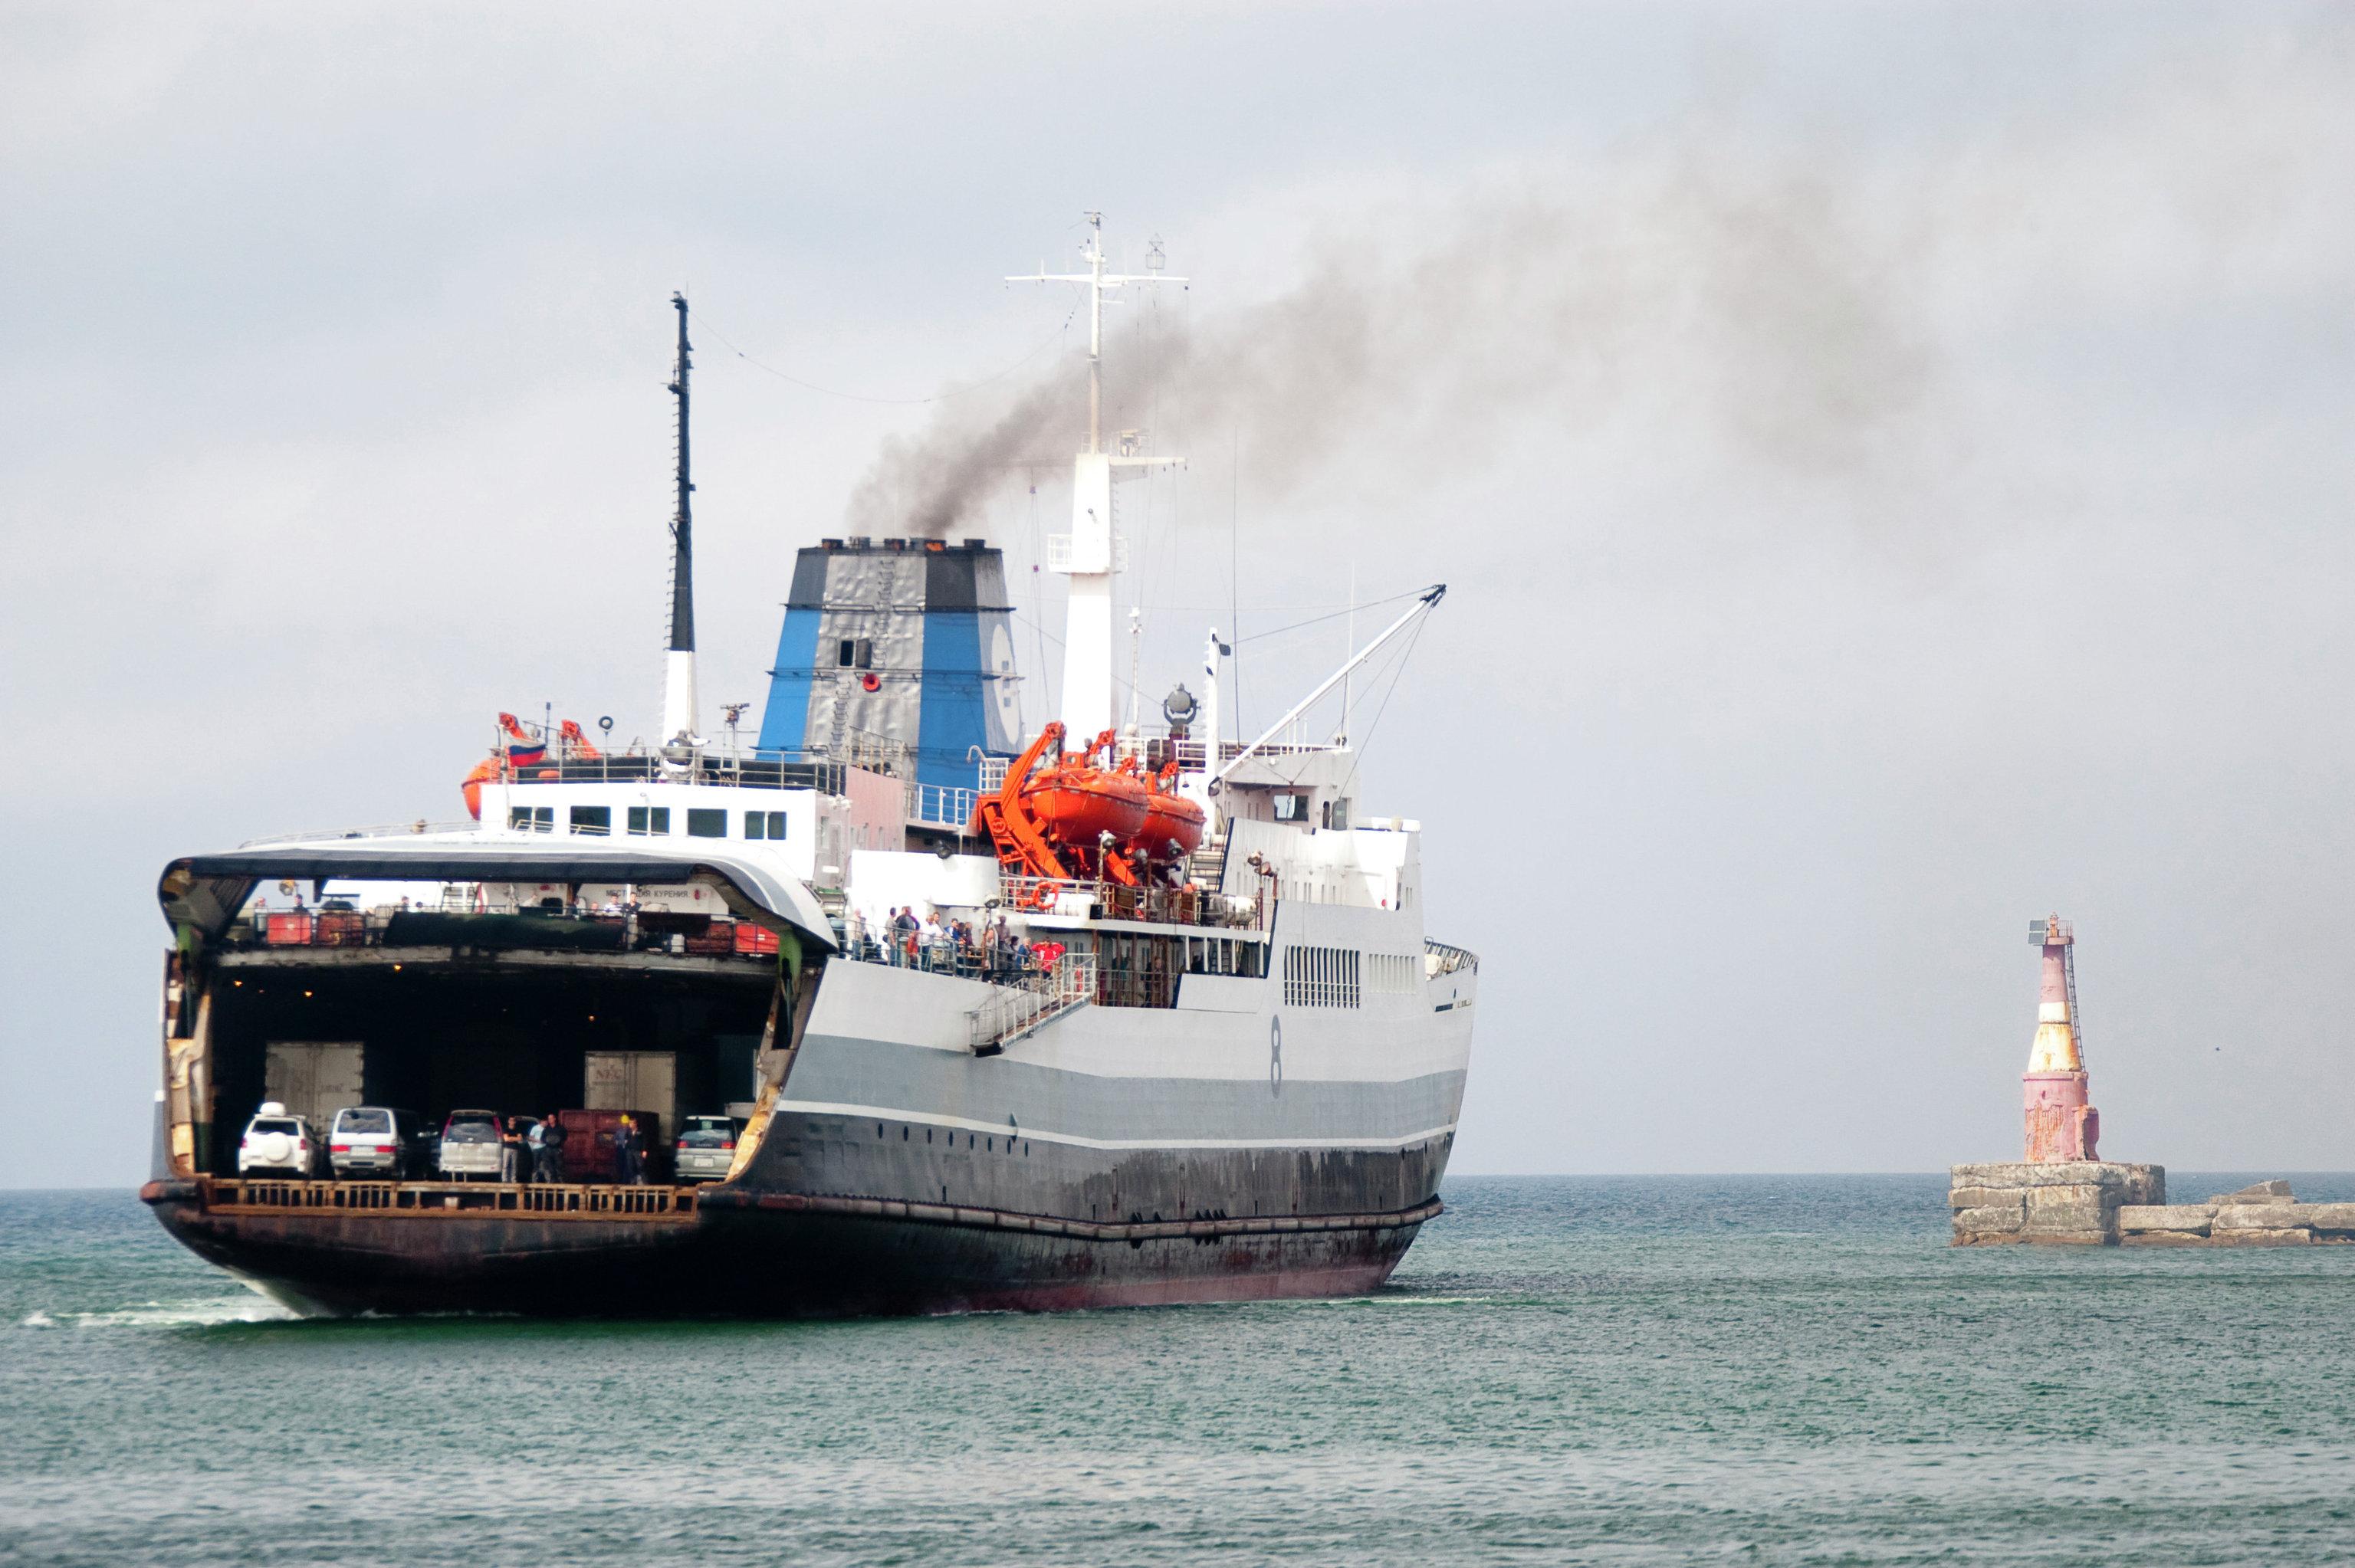 The freight ferry service from Kholmsk (Sakhalin) - Vanino (Khabarovsk Territory), seen entering the port of Kholmsk.